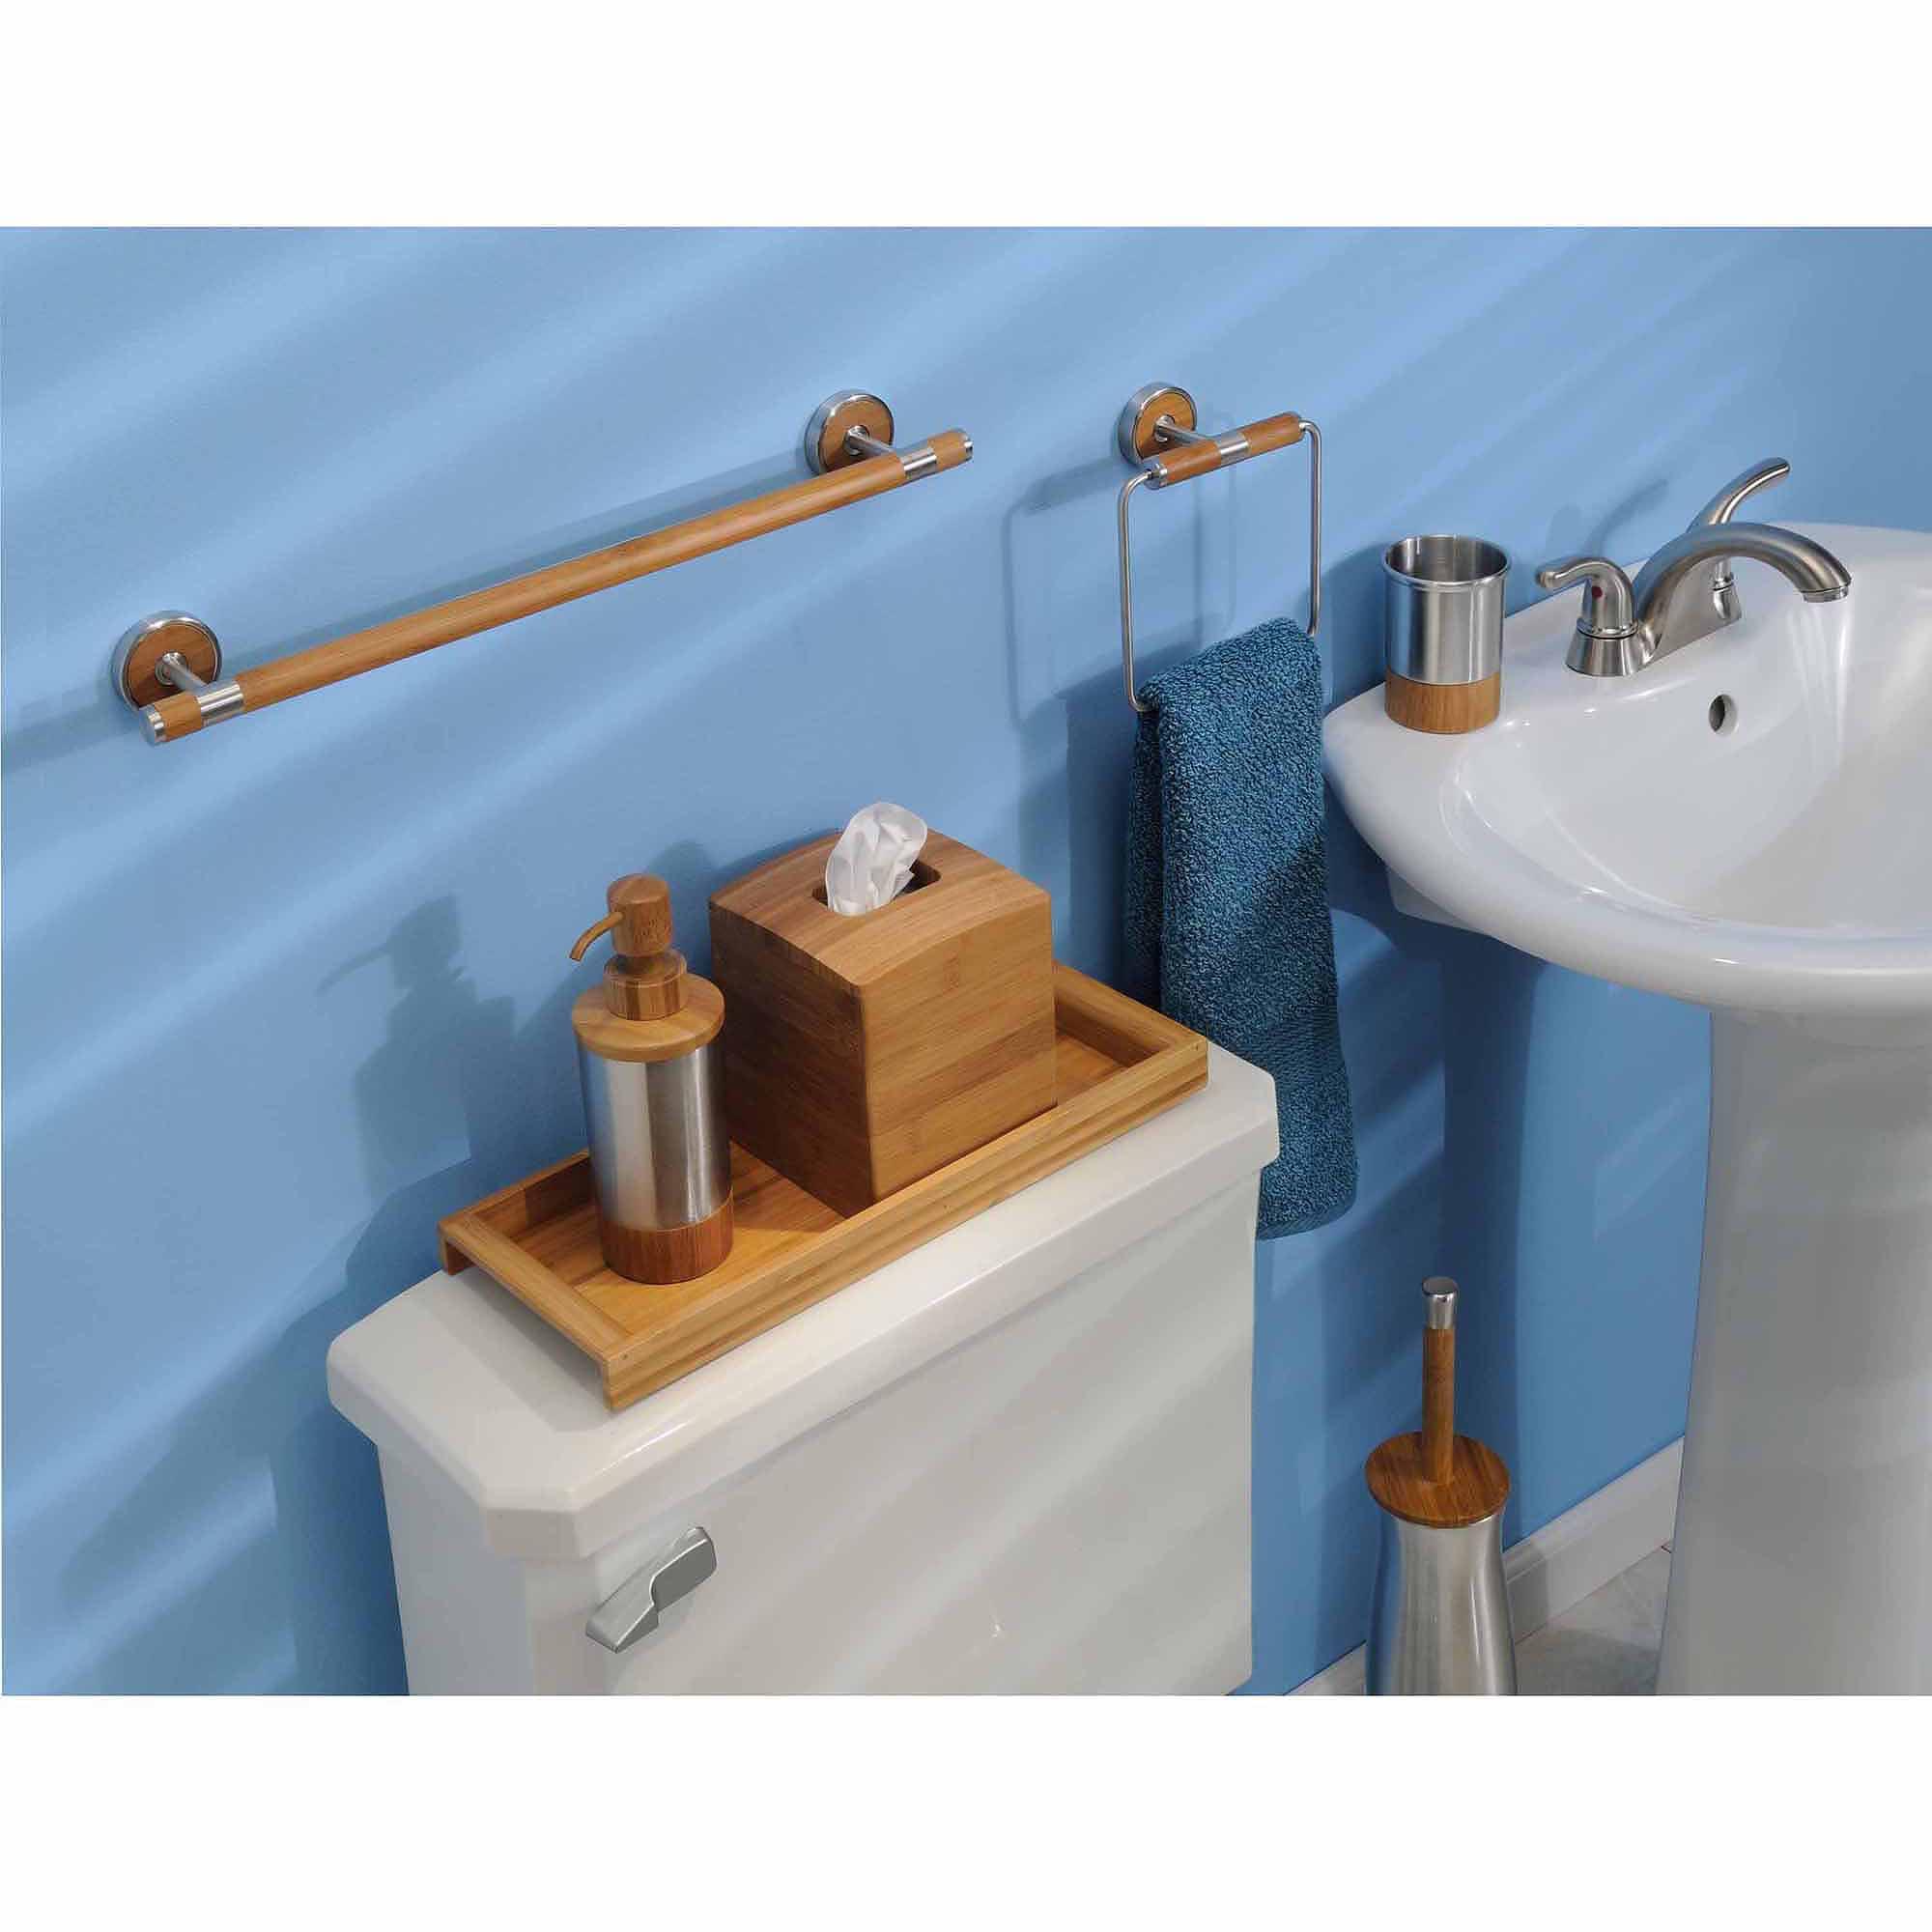 Interdesign Formbu Vanity Tray Bamboo Walmart Com Walmart Com